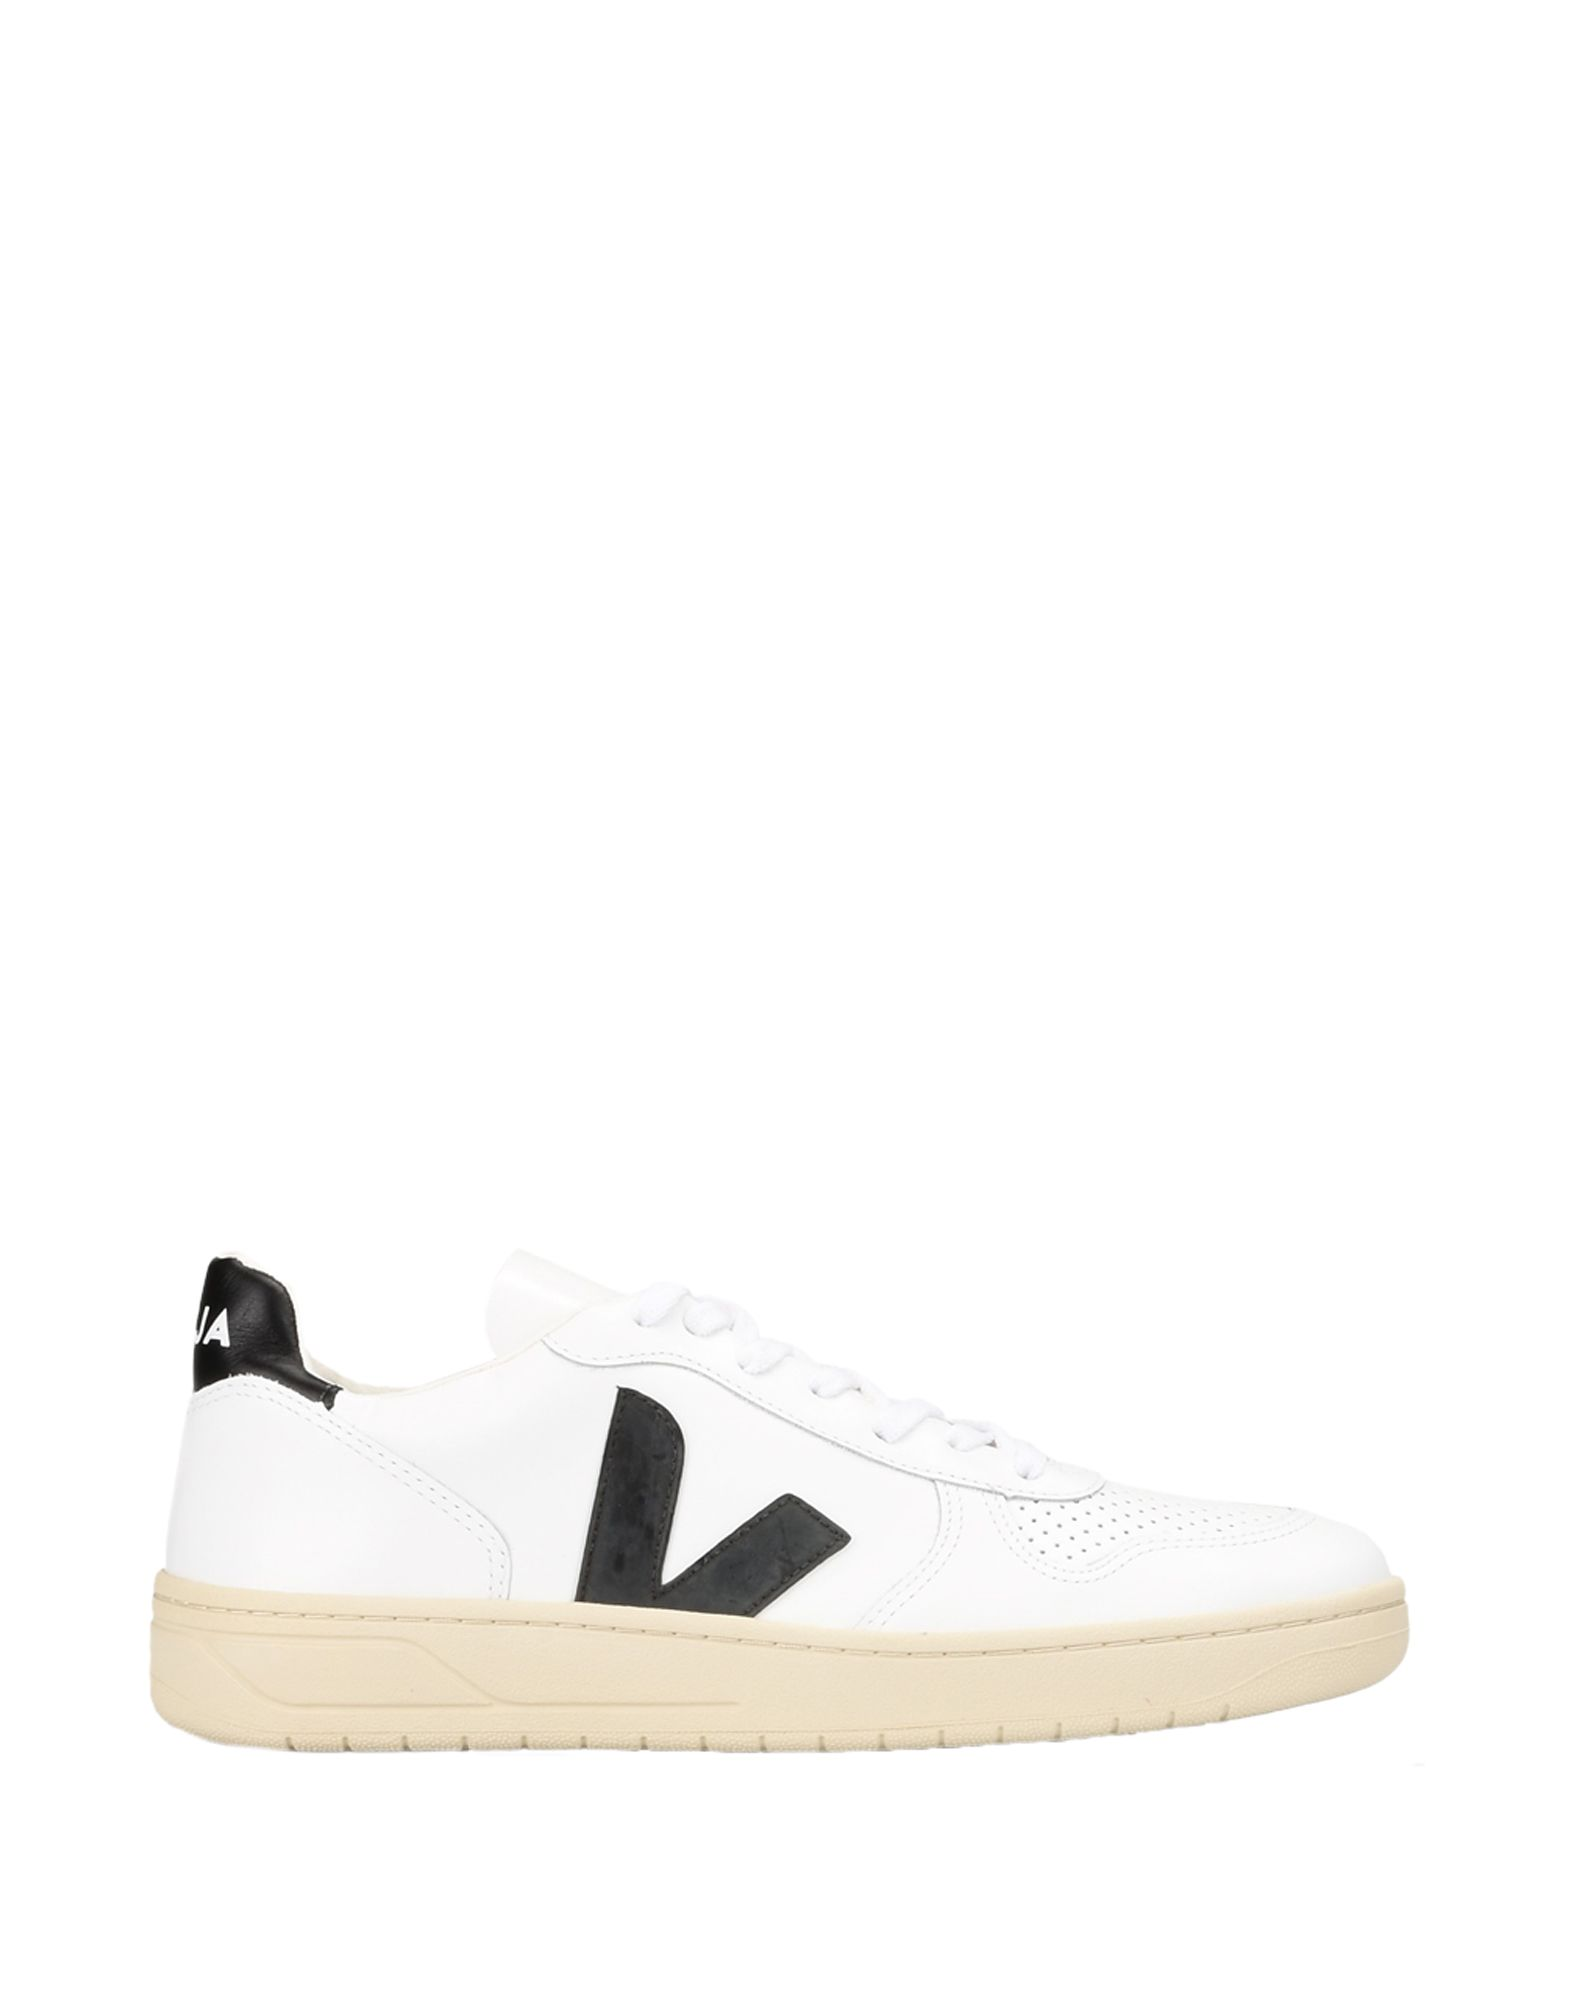 Veja Sneakers - Men Veja Sneakers Sneakers Sneakers online on  Australia - 11306287WC 25b559